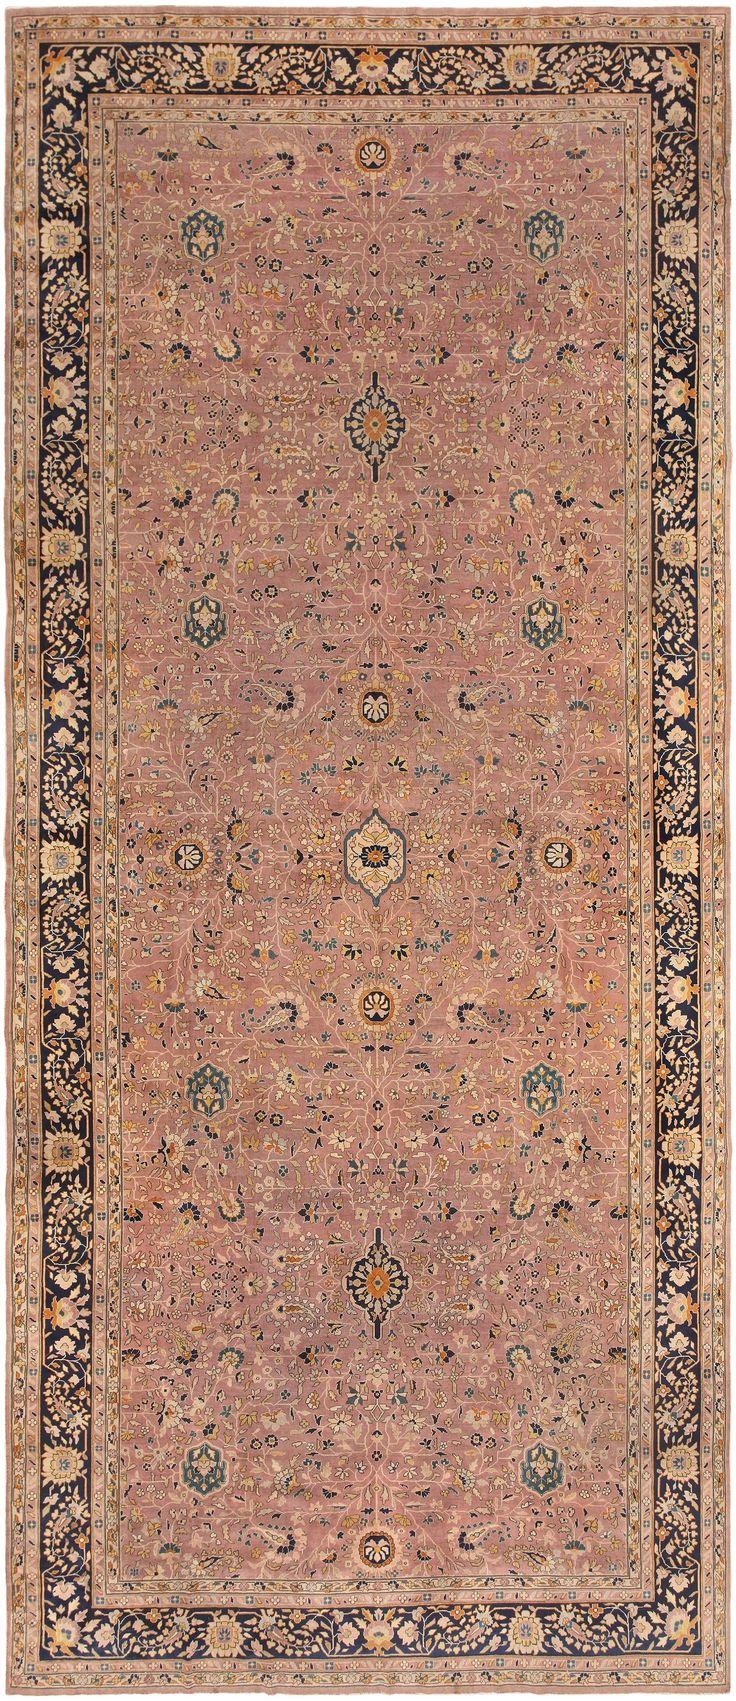 High Quality Large Antique Lavender Indian Rug 46761